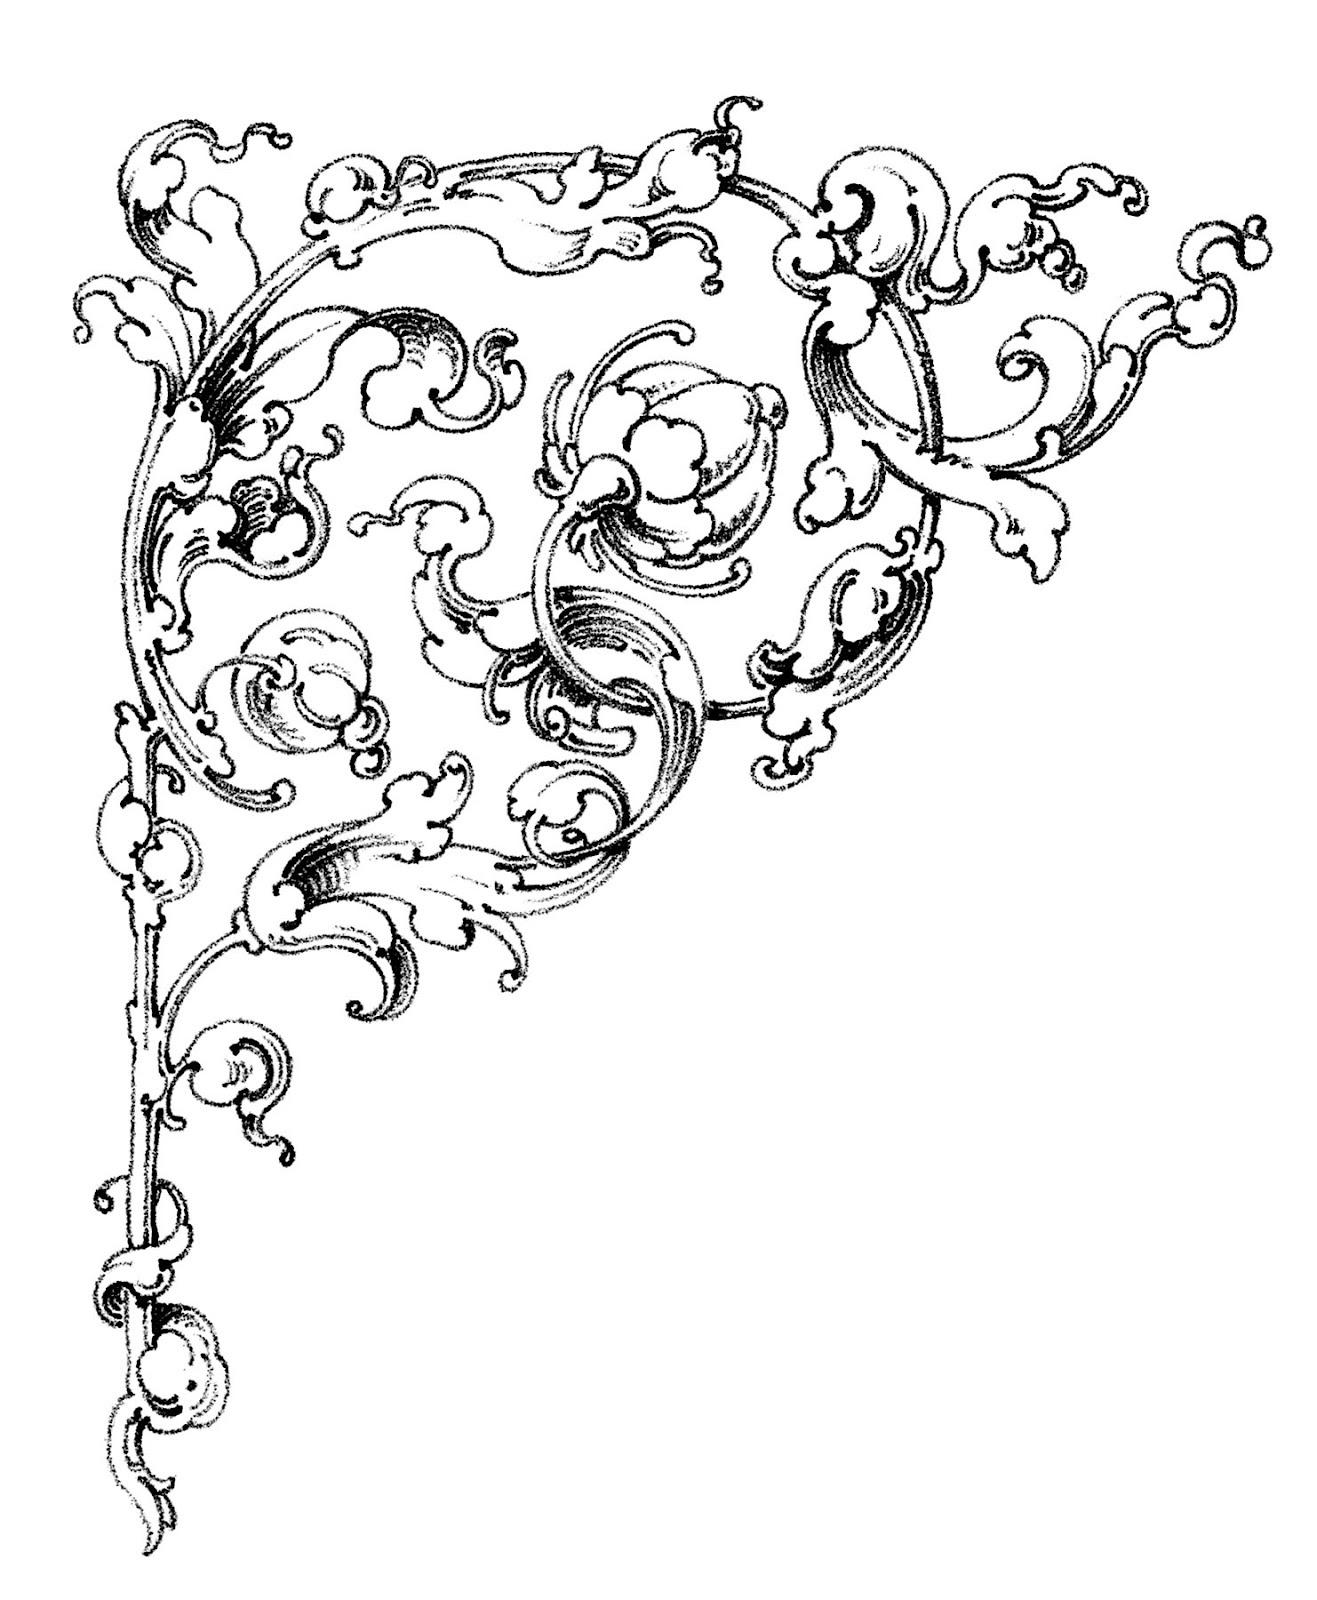 Dreamy Romantic Scrolls - Wedding Clip Art - The Graphics Fairy - Free Printable Wedding Scrolls